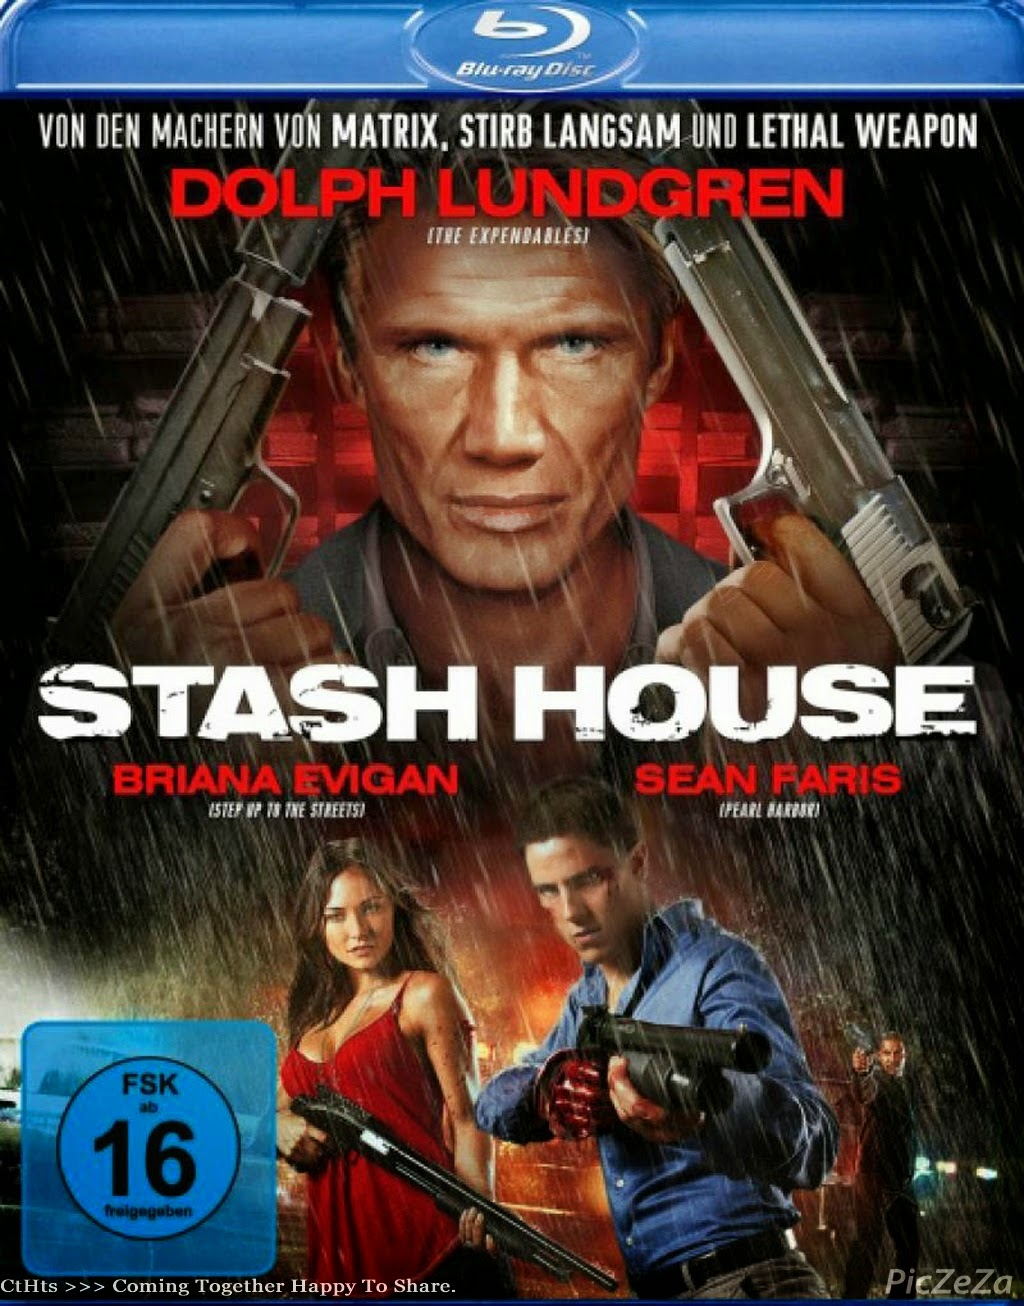 Stash house : คนโหดปิดบ้านเชือด